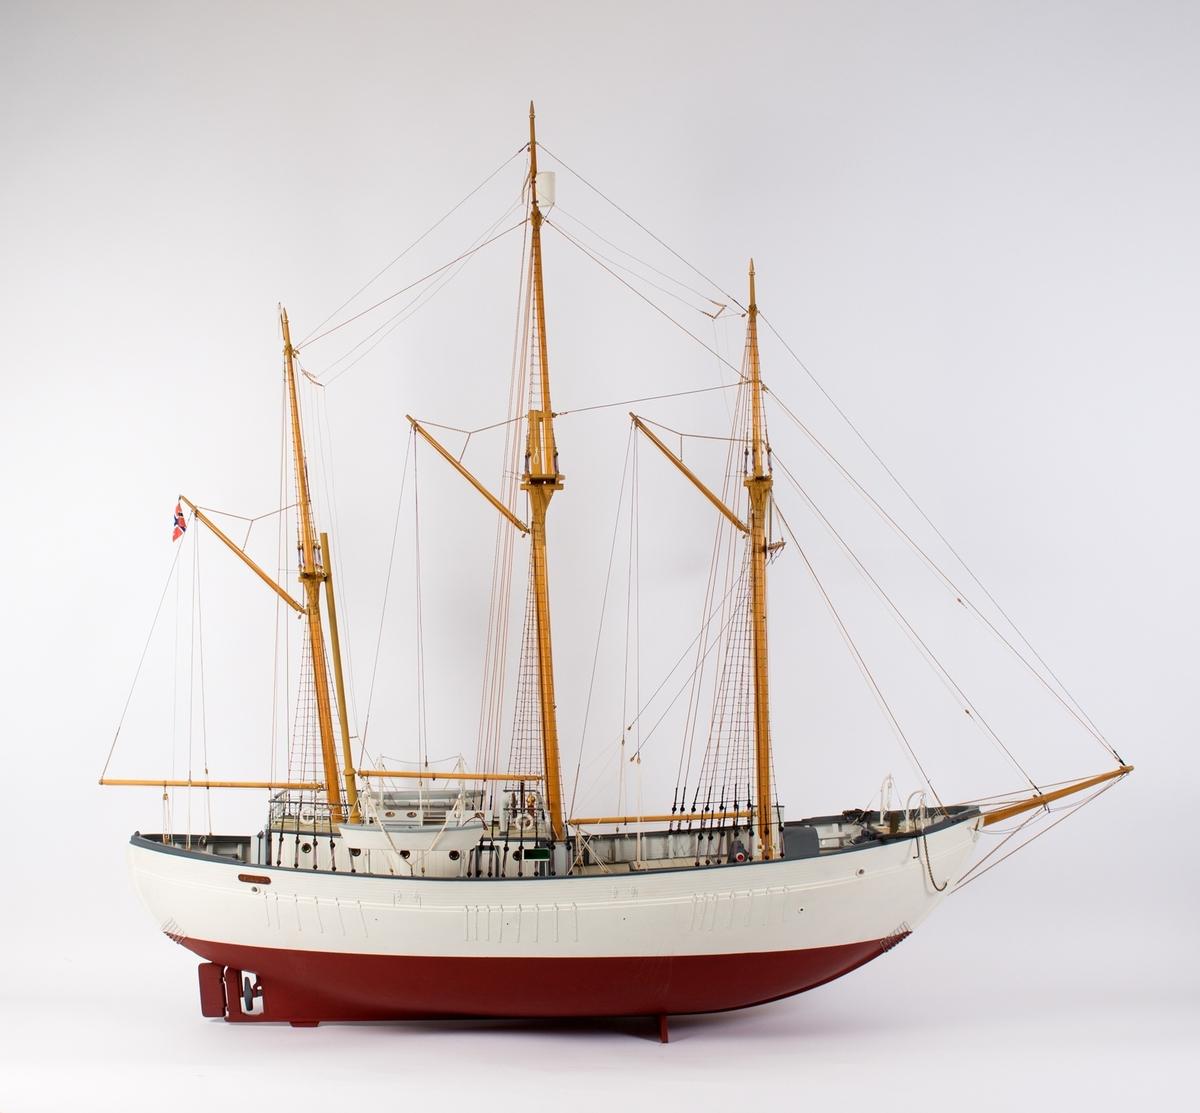 Skipsmodell av polarskipet MAUD